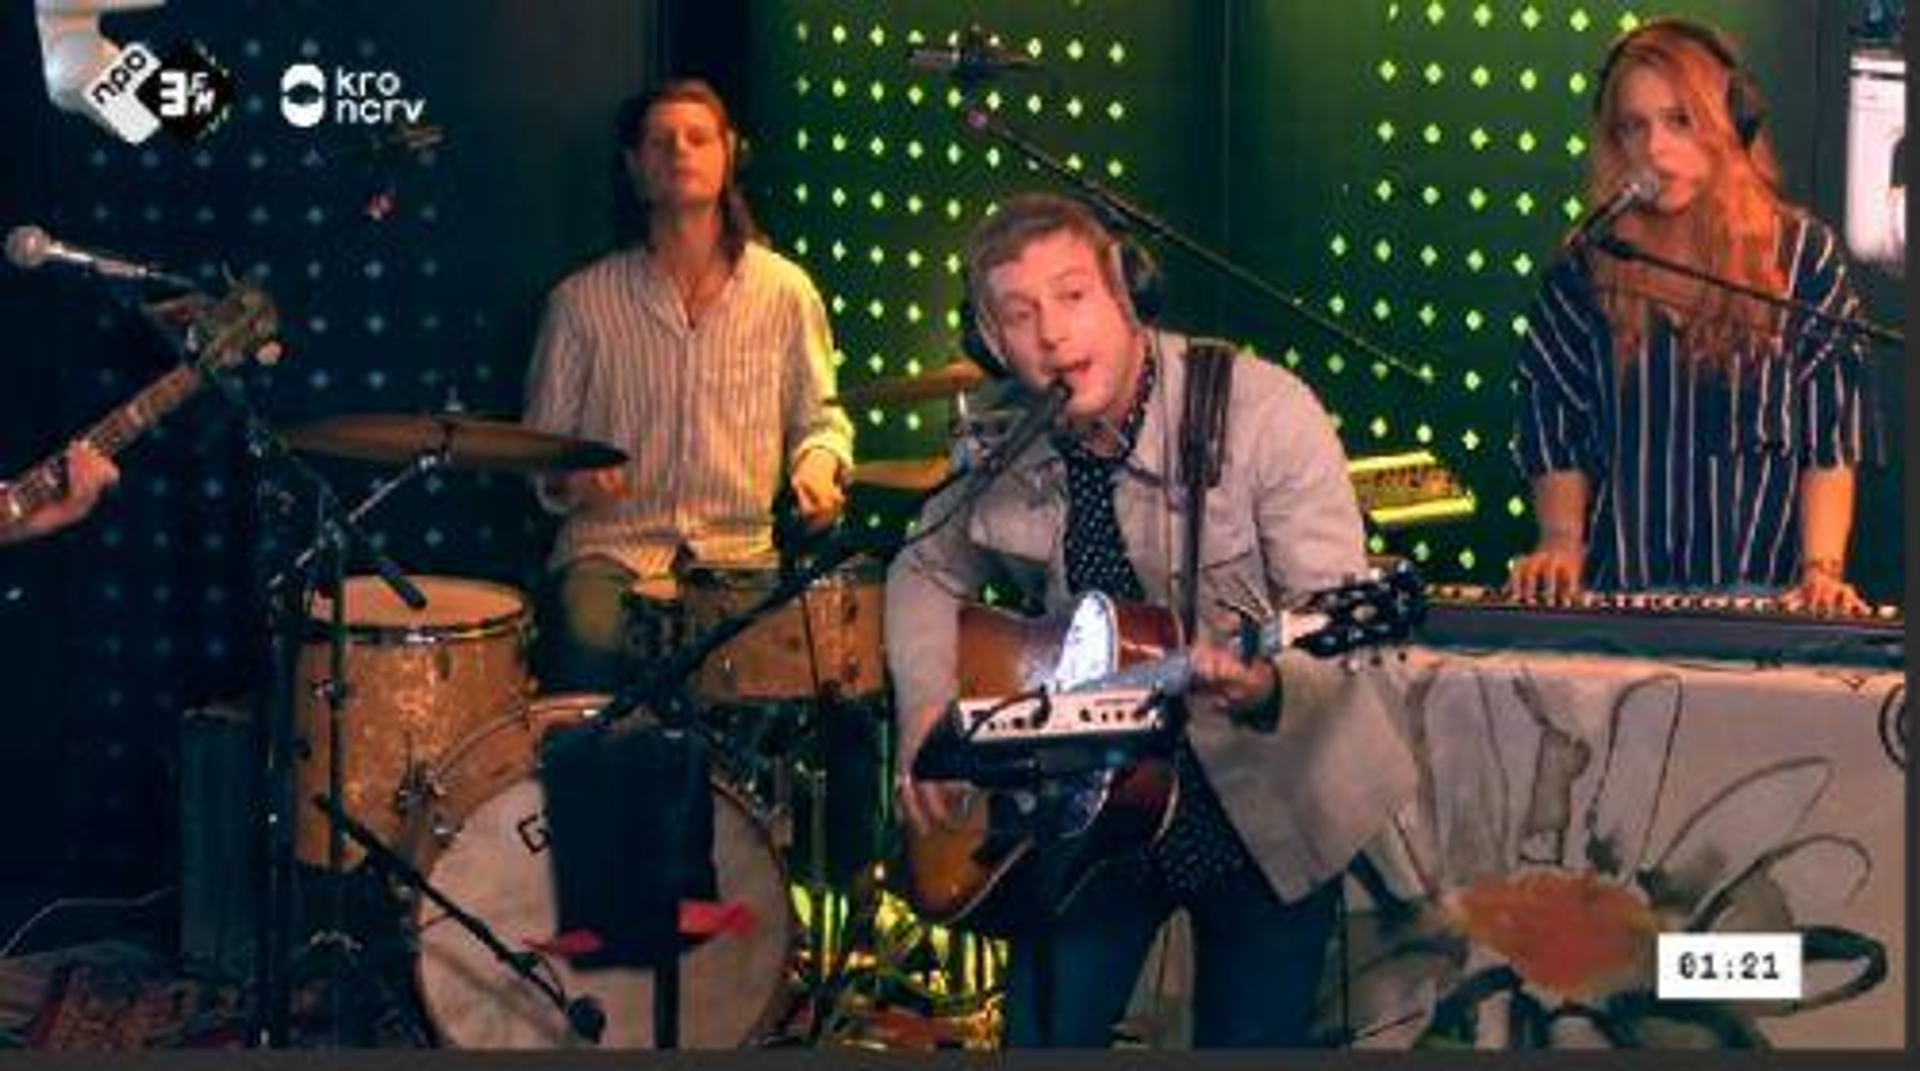 Electric Company - Mathilda (Live @ Kevin) #3FM #livemuziek